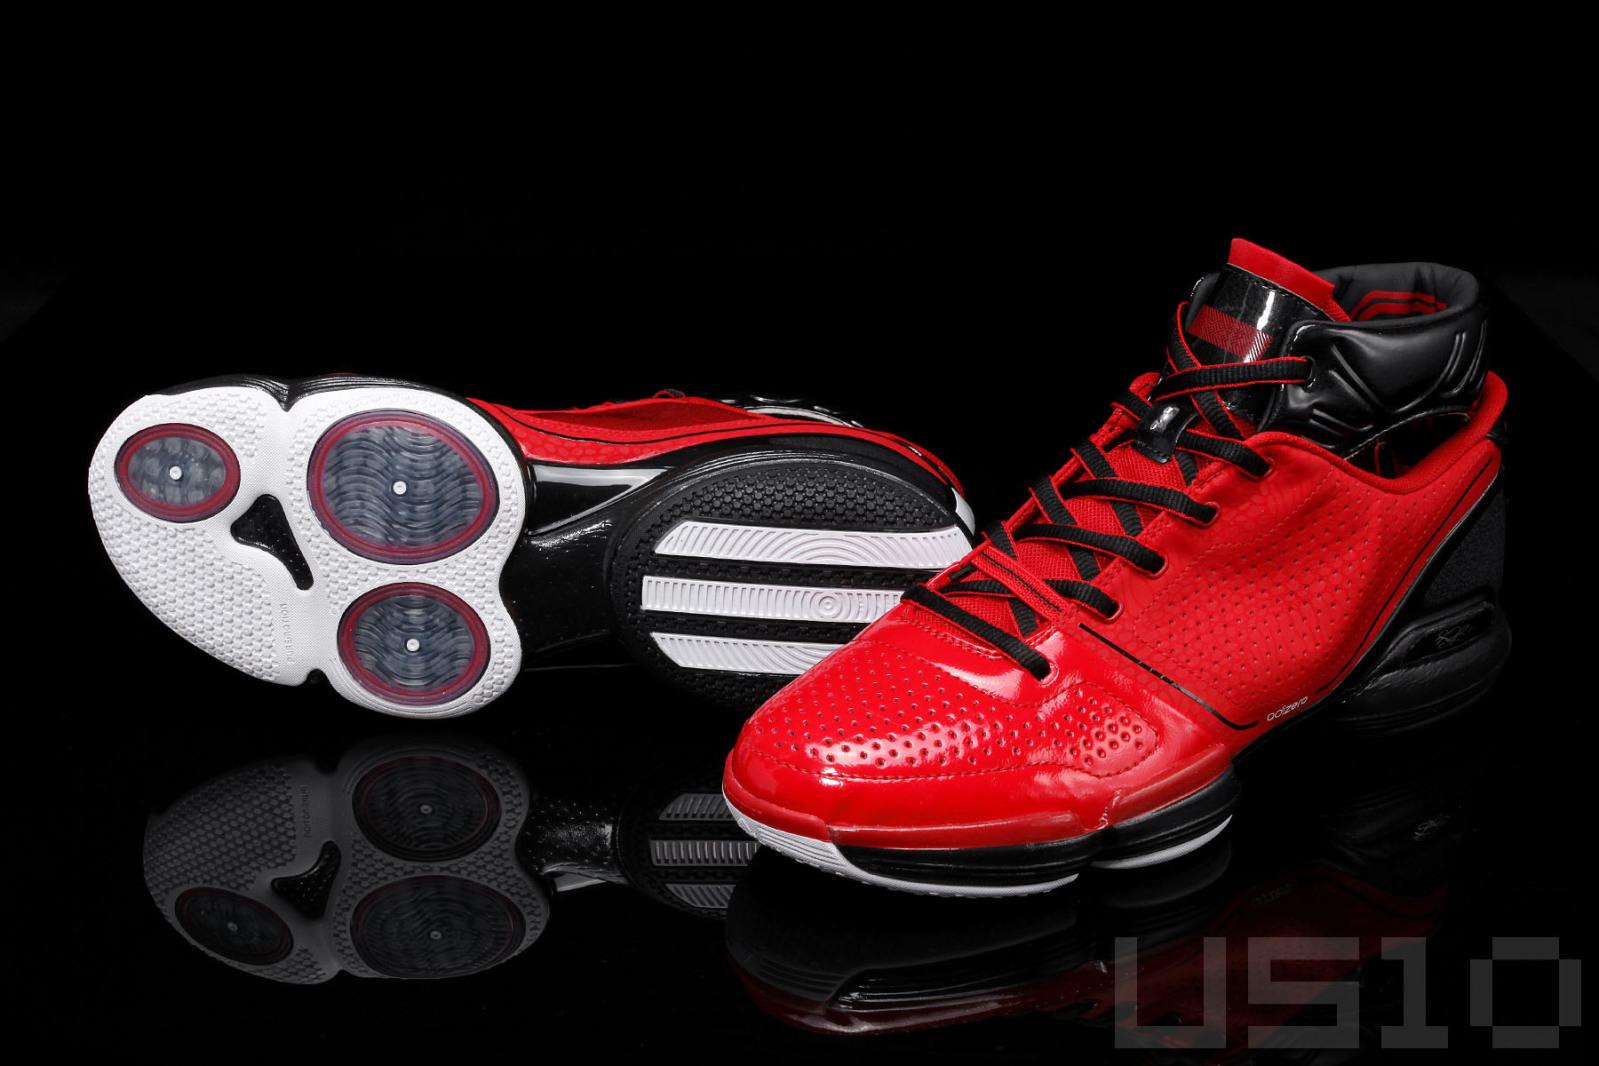 22a702b59b3d adidas adiZero Rose - University Red Black - Detailed Images